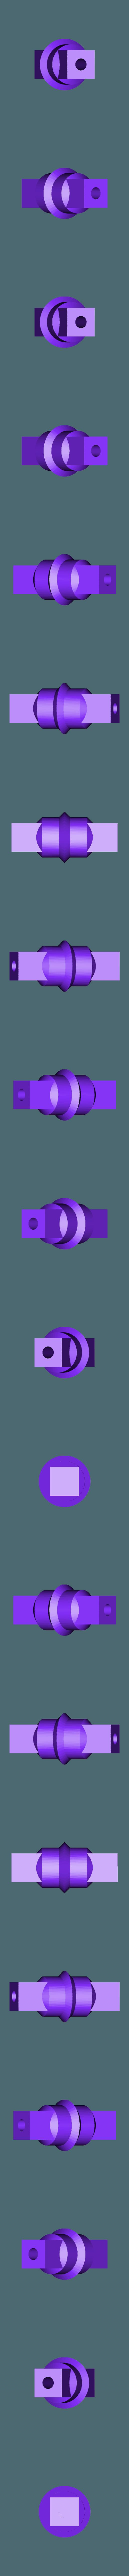 TruckV3_Axle1_rear_pinion_gear.STL Download STL file 3D Printed RC Truck V3 • 3D print model, MrCrankyface